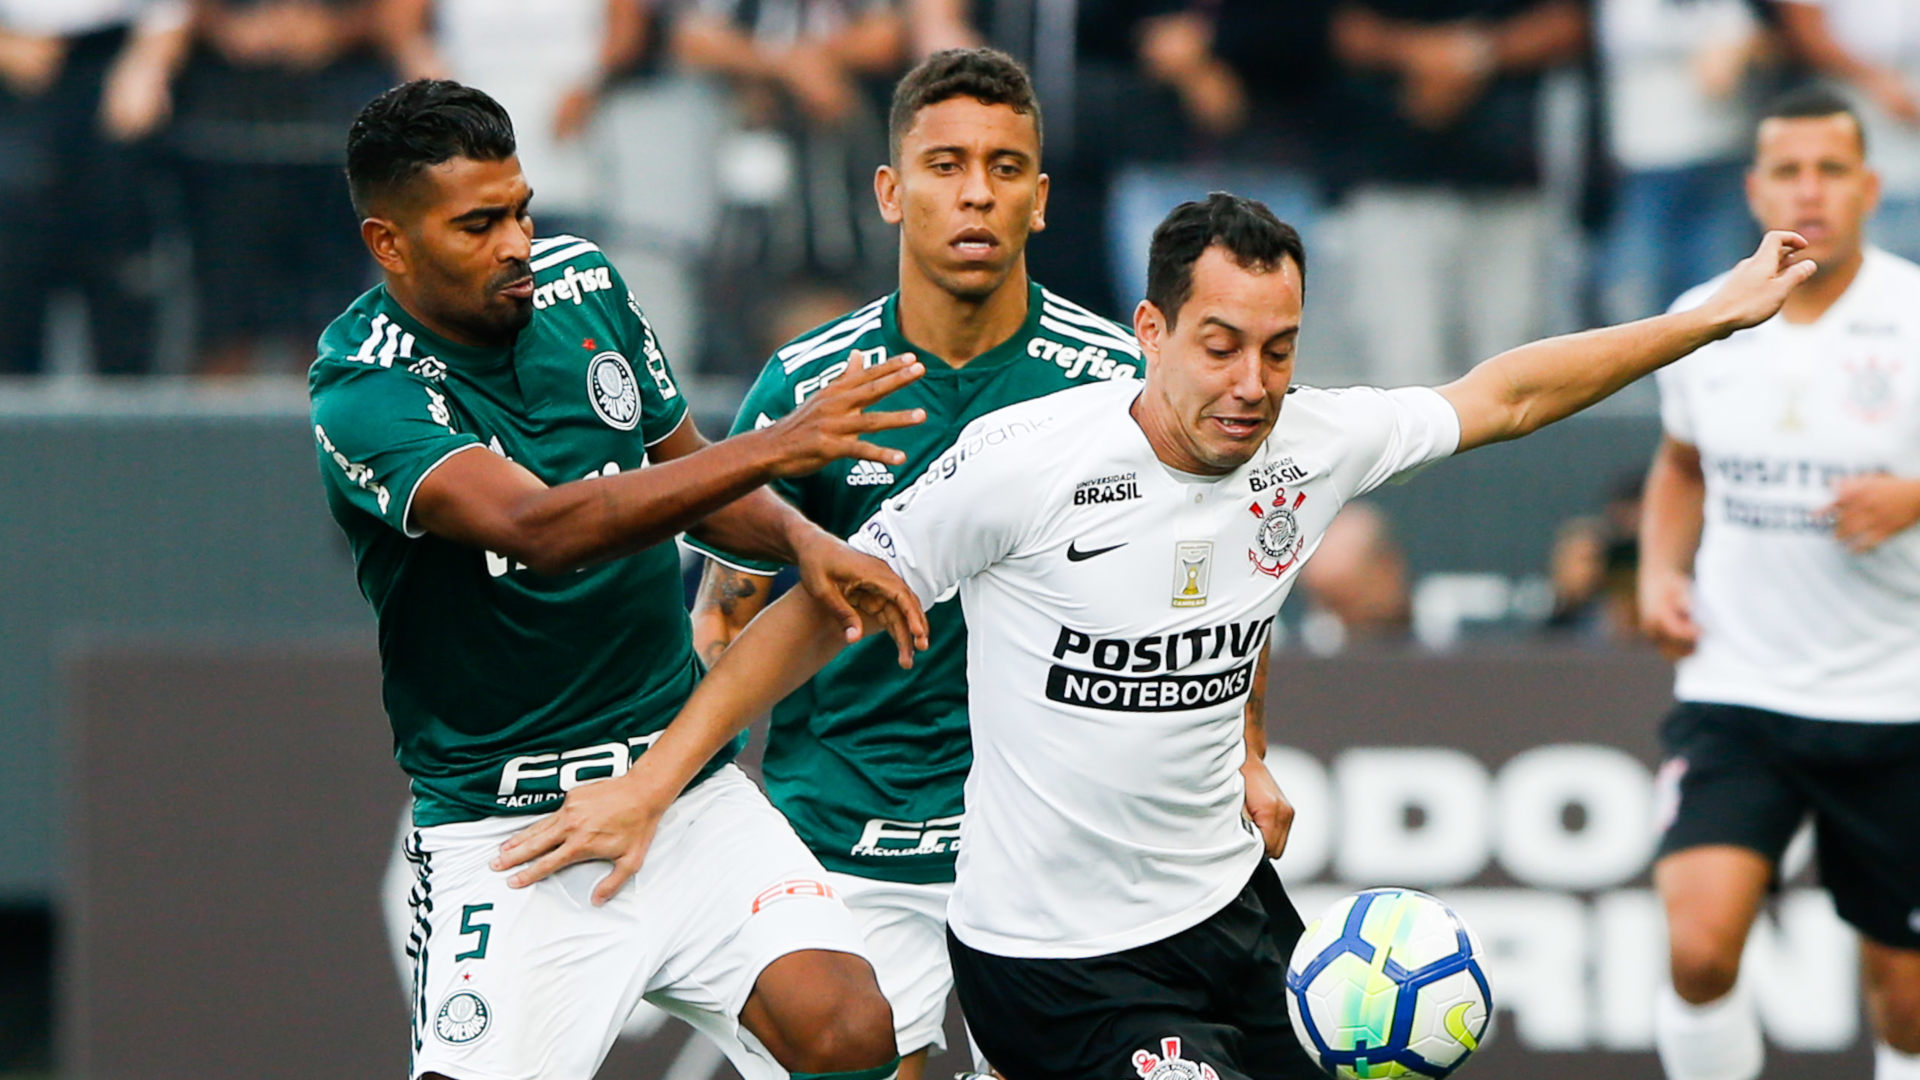 Rodriguinho Marcos Rocha Thiago Santos Corinthians Palmeiras Brasileirao Serie A 13052018